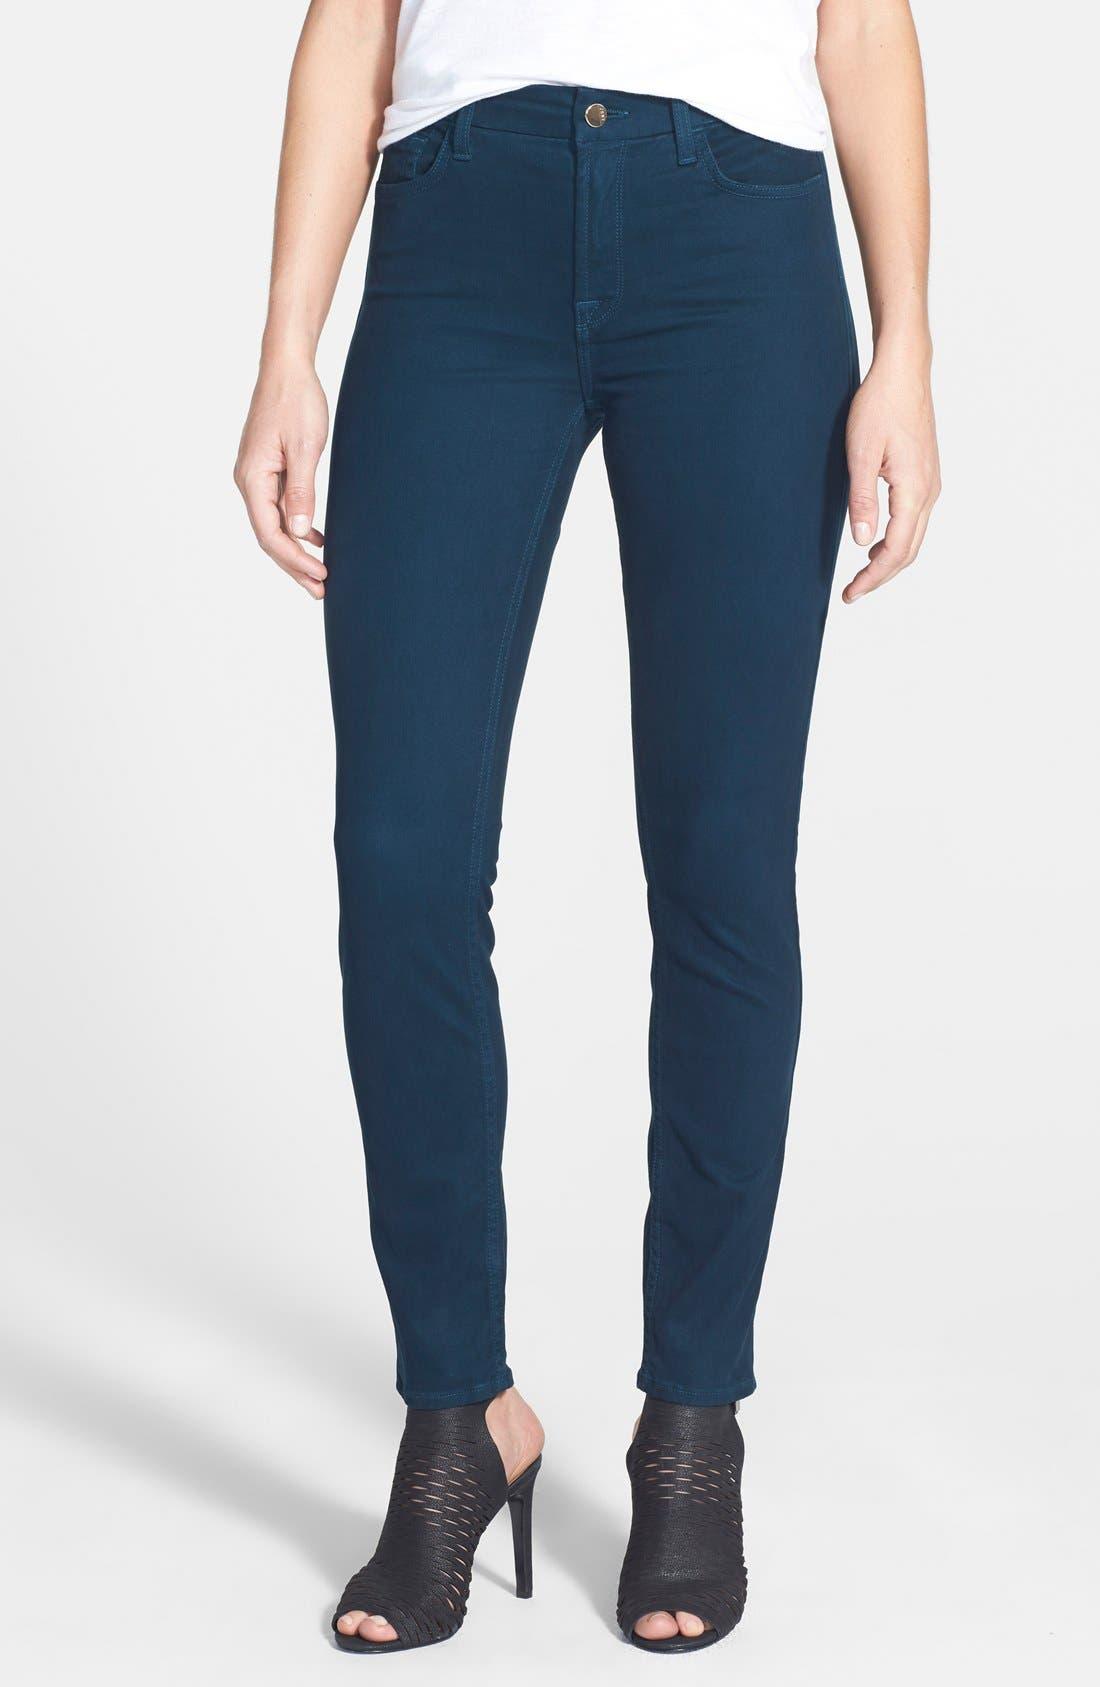 Alternate Image 1 Selected - Jen7 Colored Stretch Denim Skinny Jeans